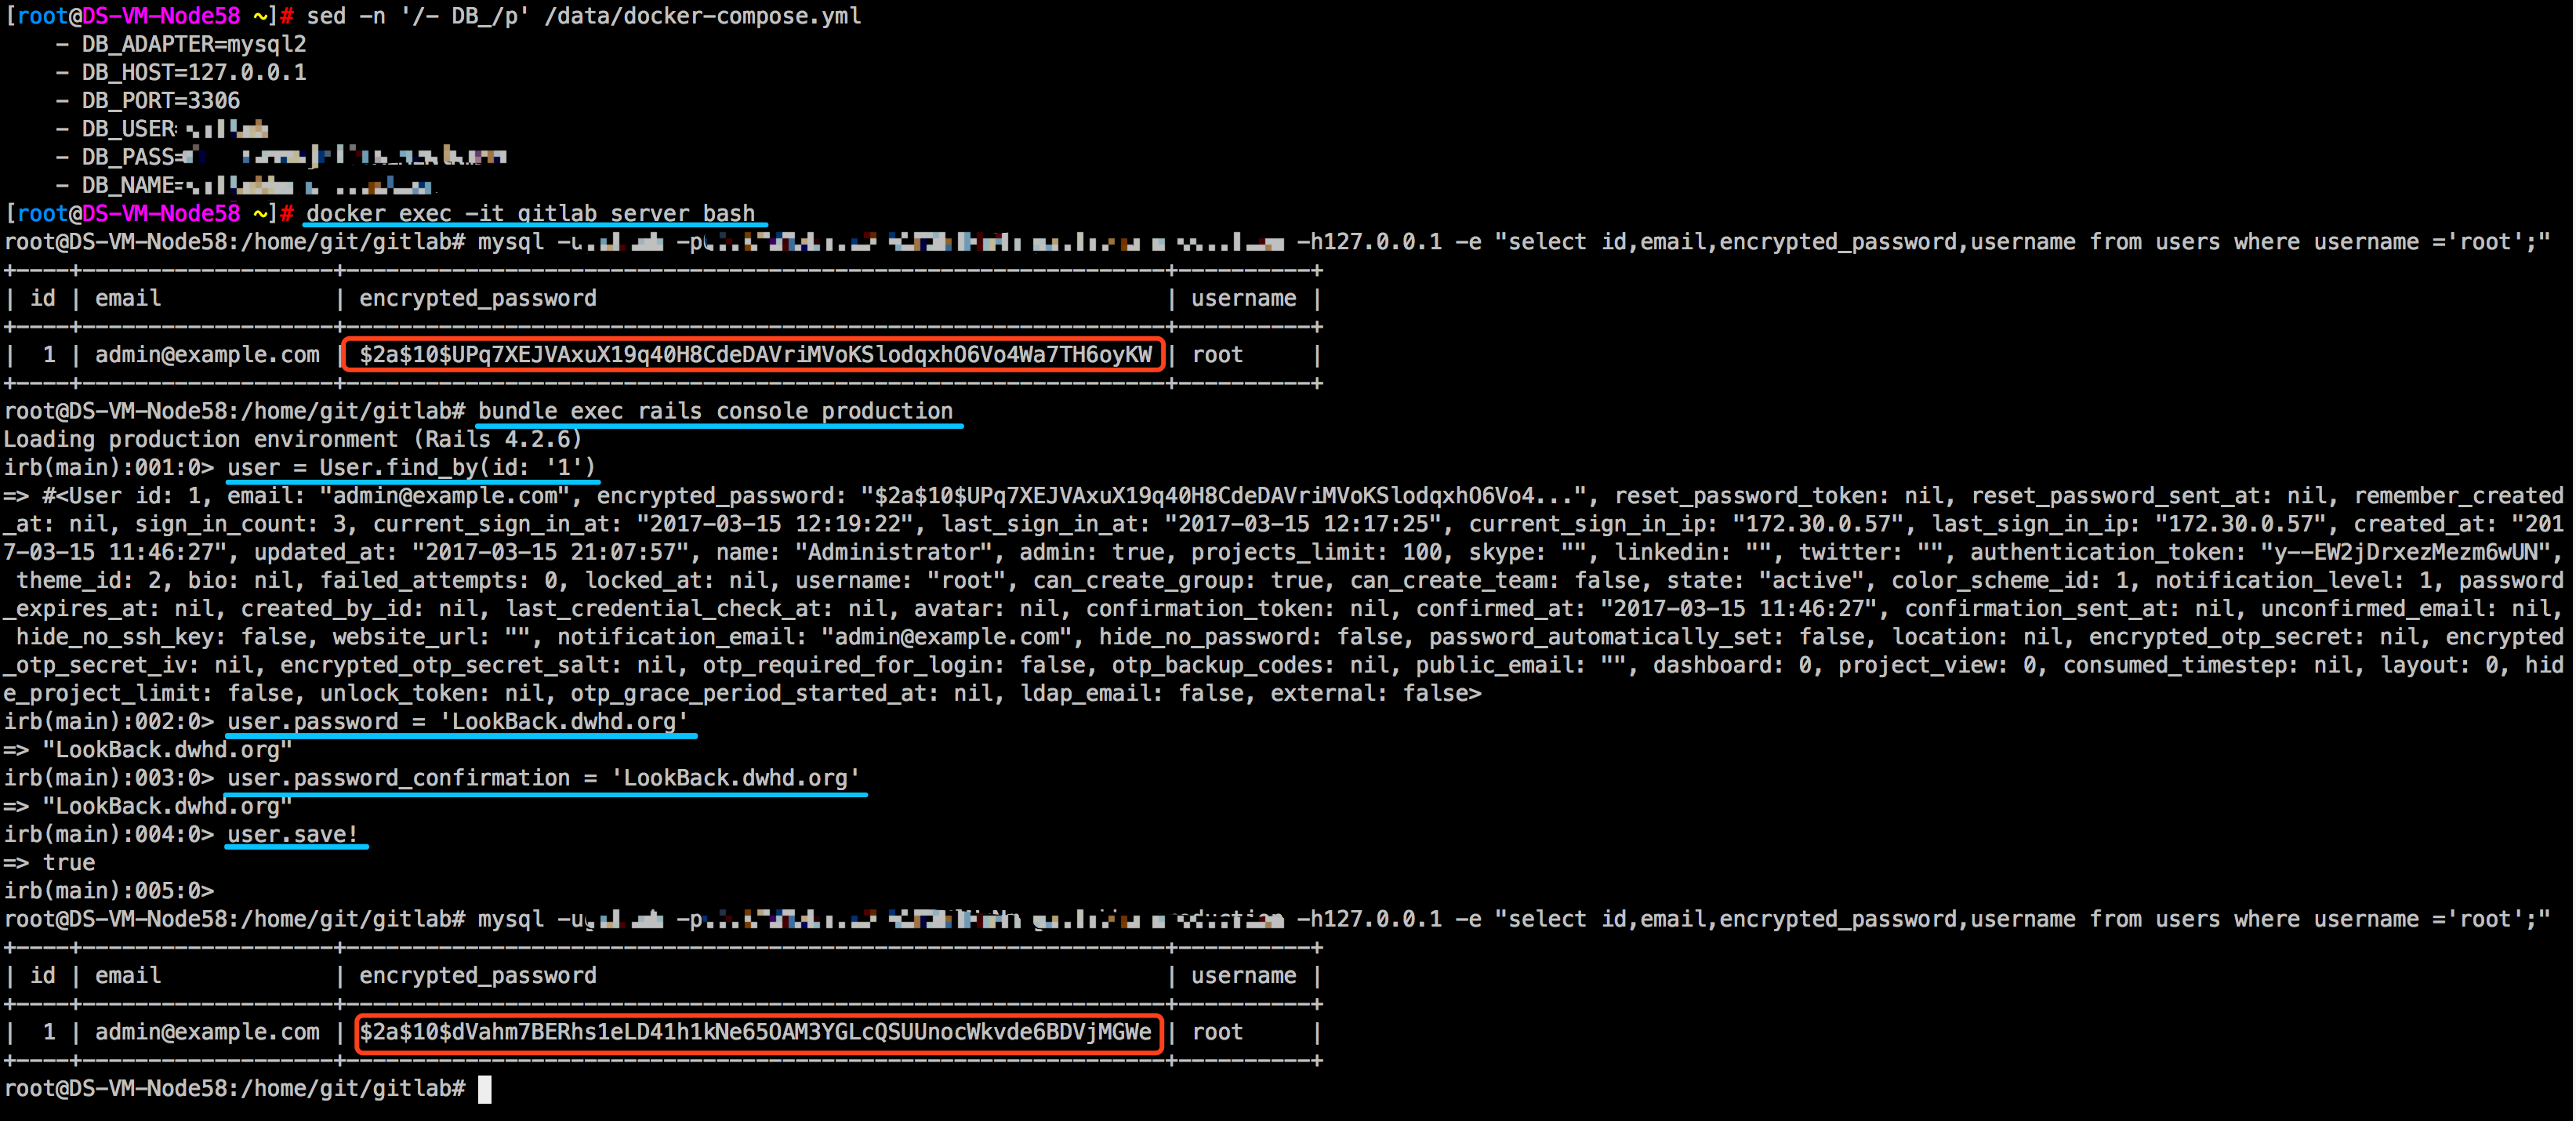 GitLab在重置用户密码 - 找回root密码